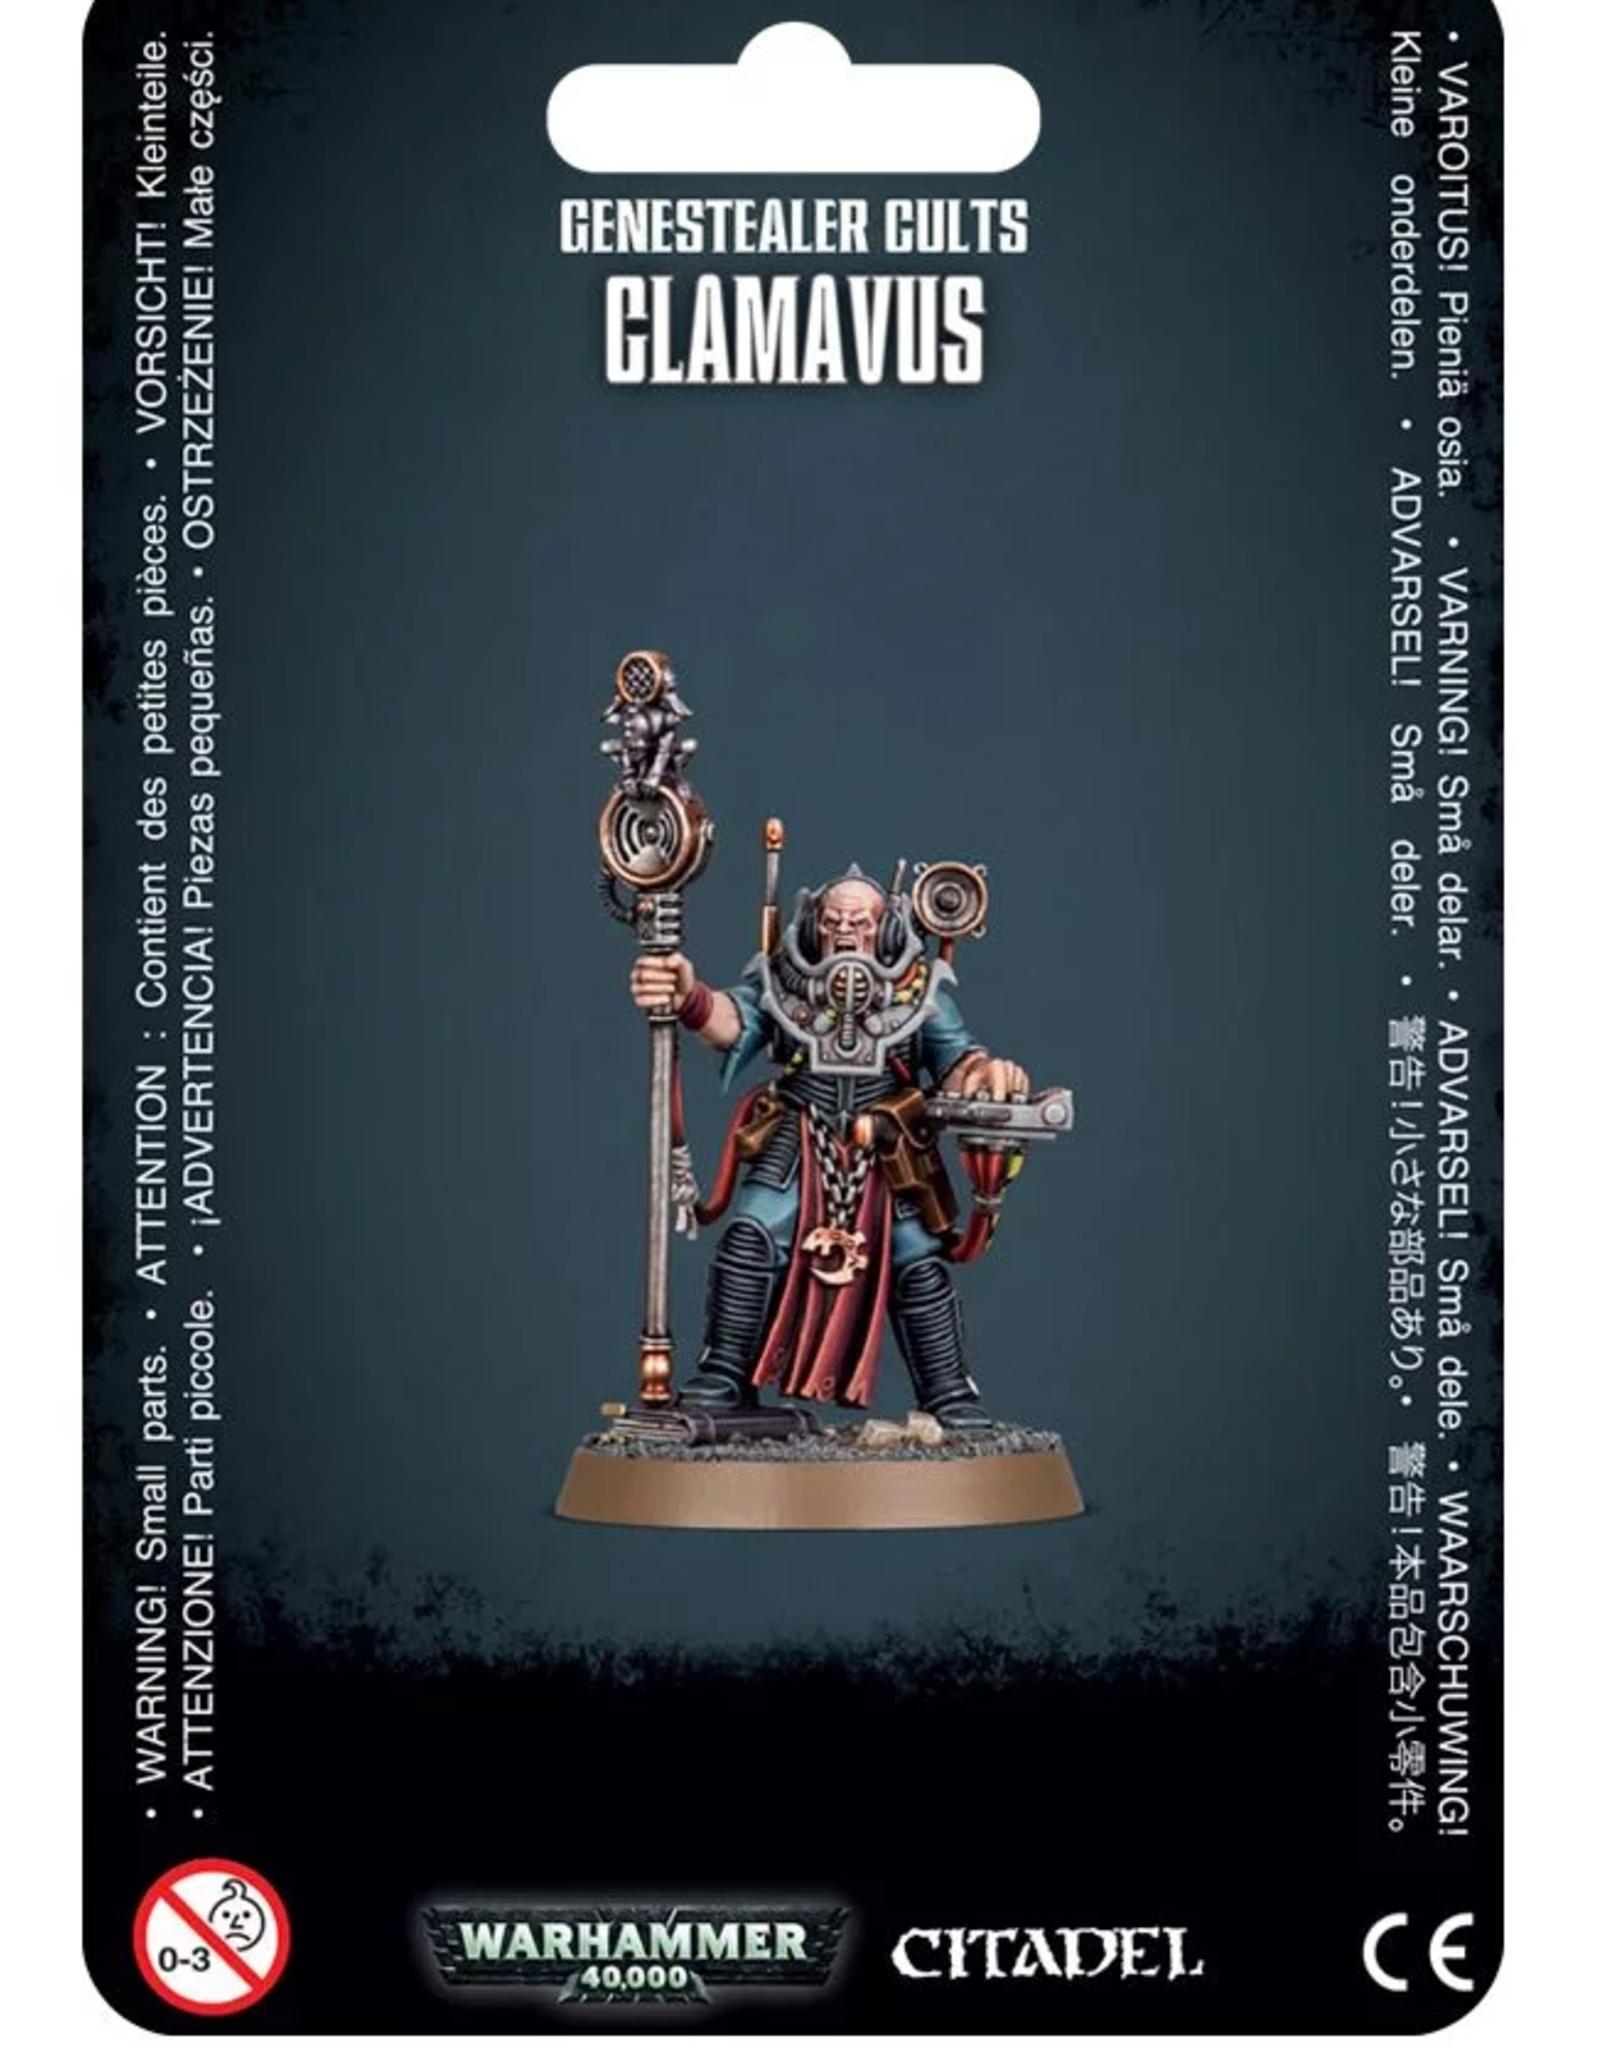 Games Workshop Genestealer Cult: Clamavus